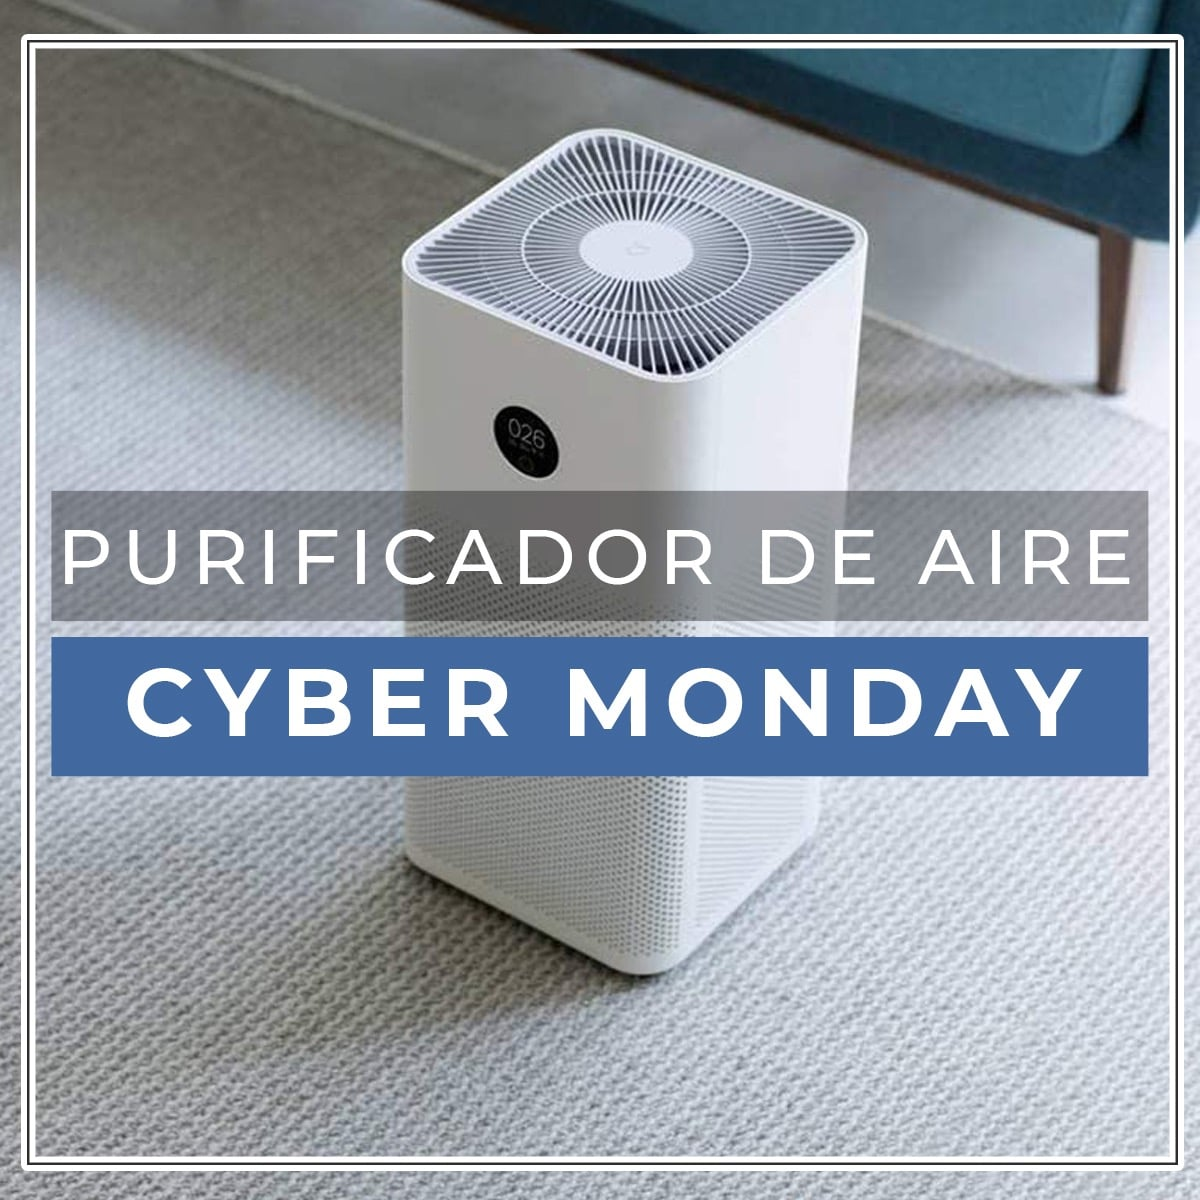 purificador de aire cyber monday